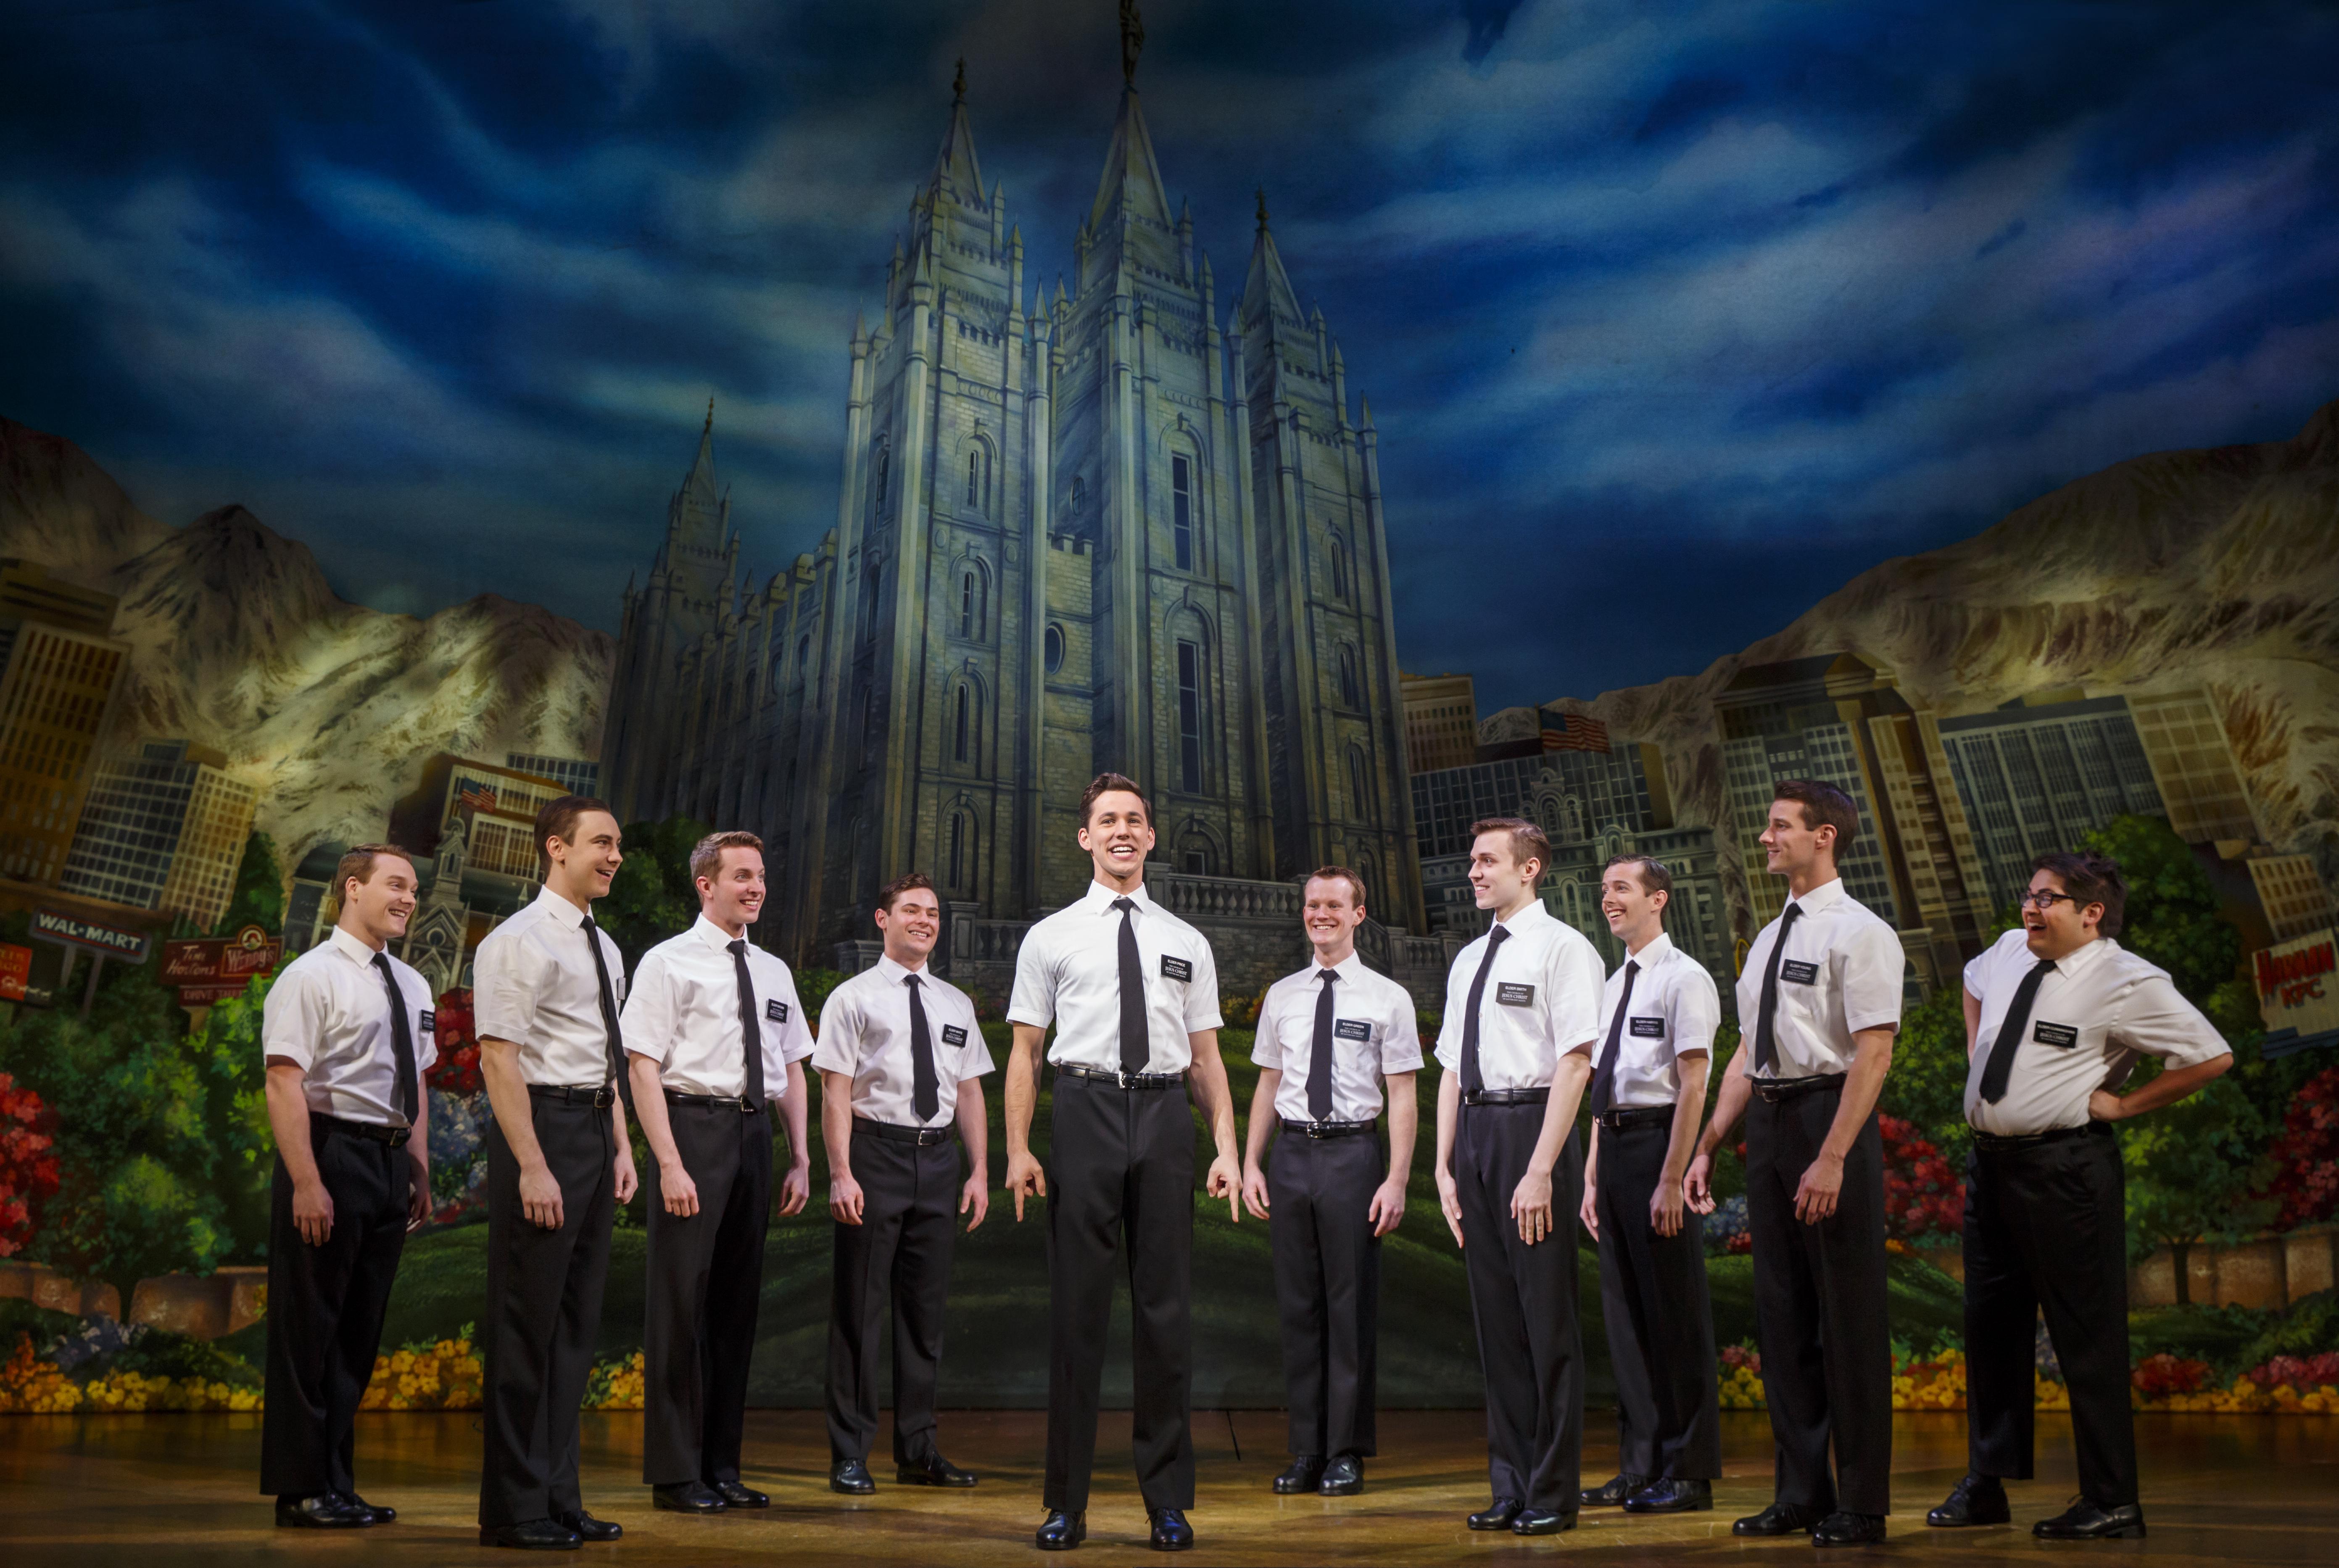 rencontres Mormon les gars Hook up Britney lyrics